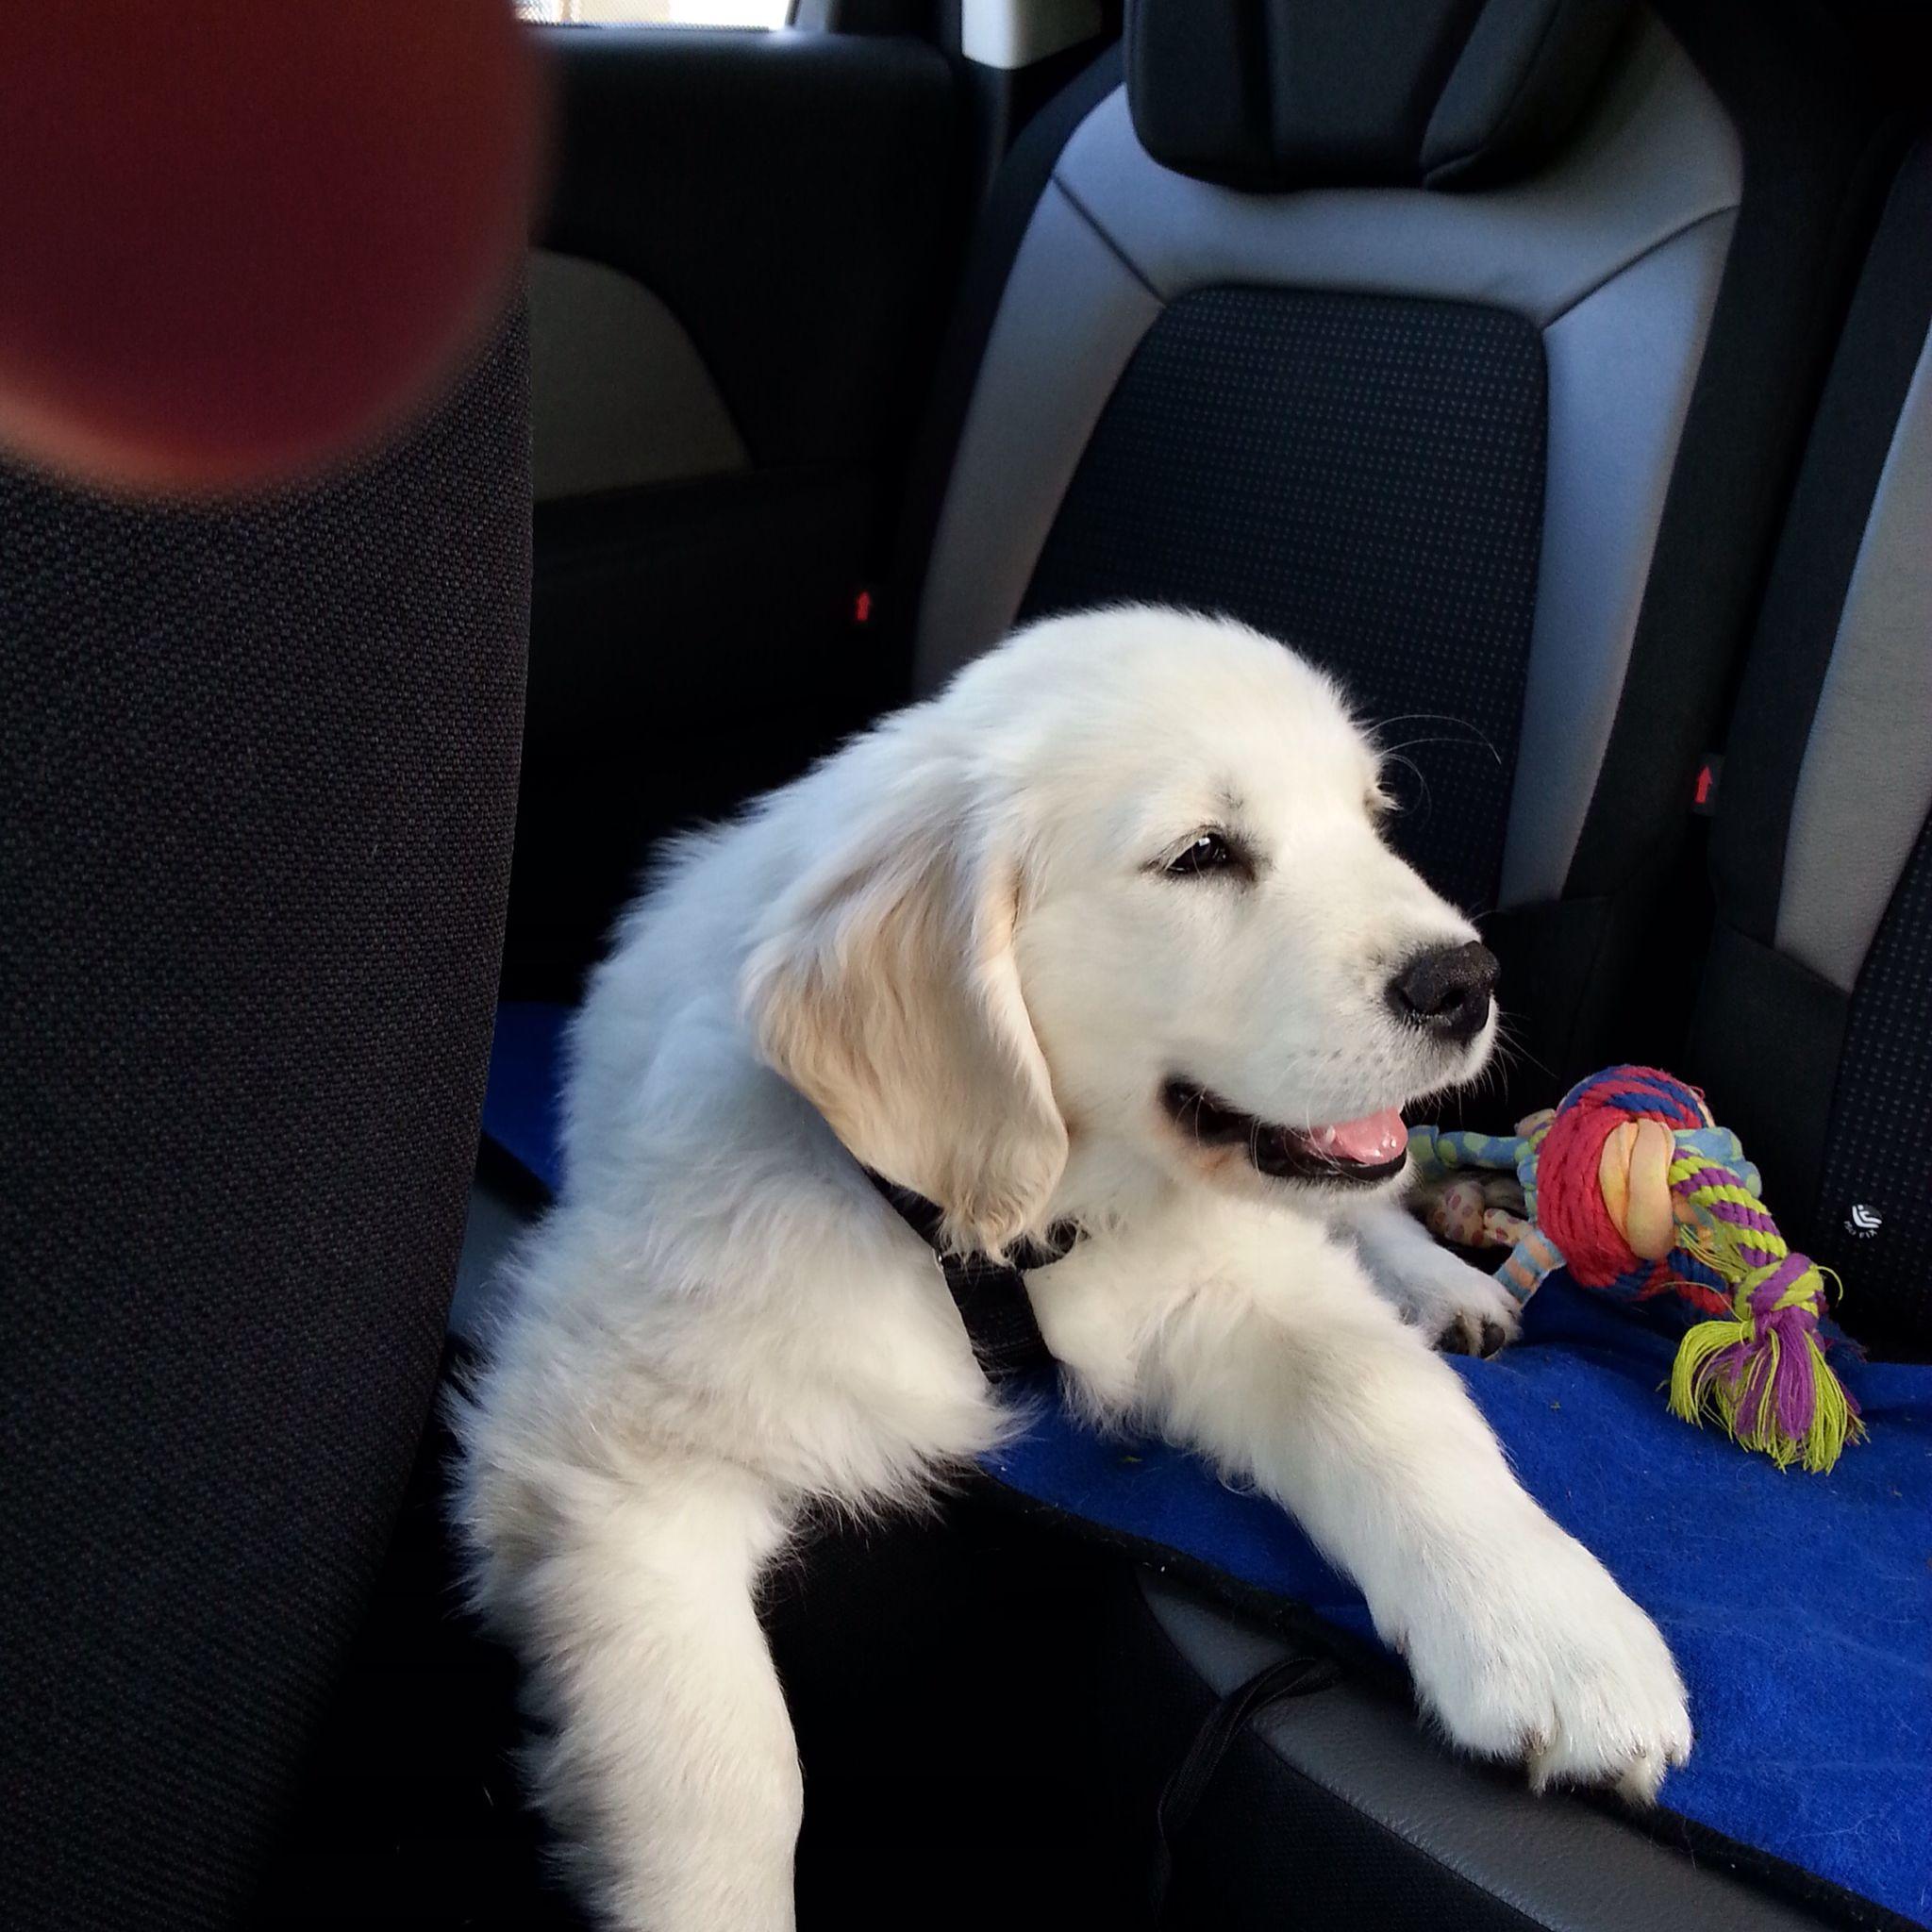 La voiture. J'adore !!! White golden retriever puppy